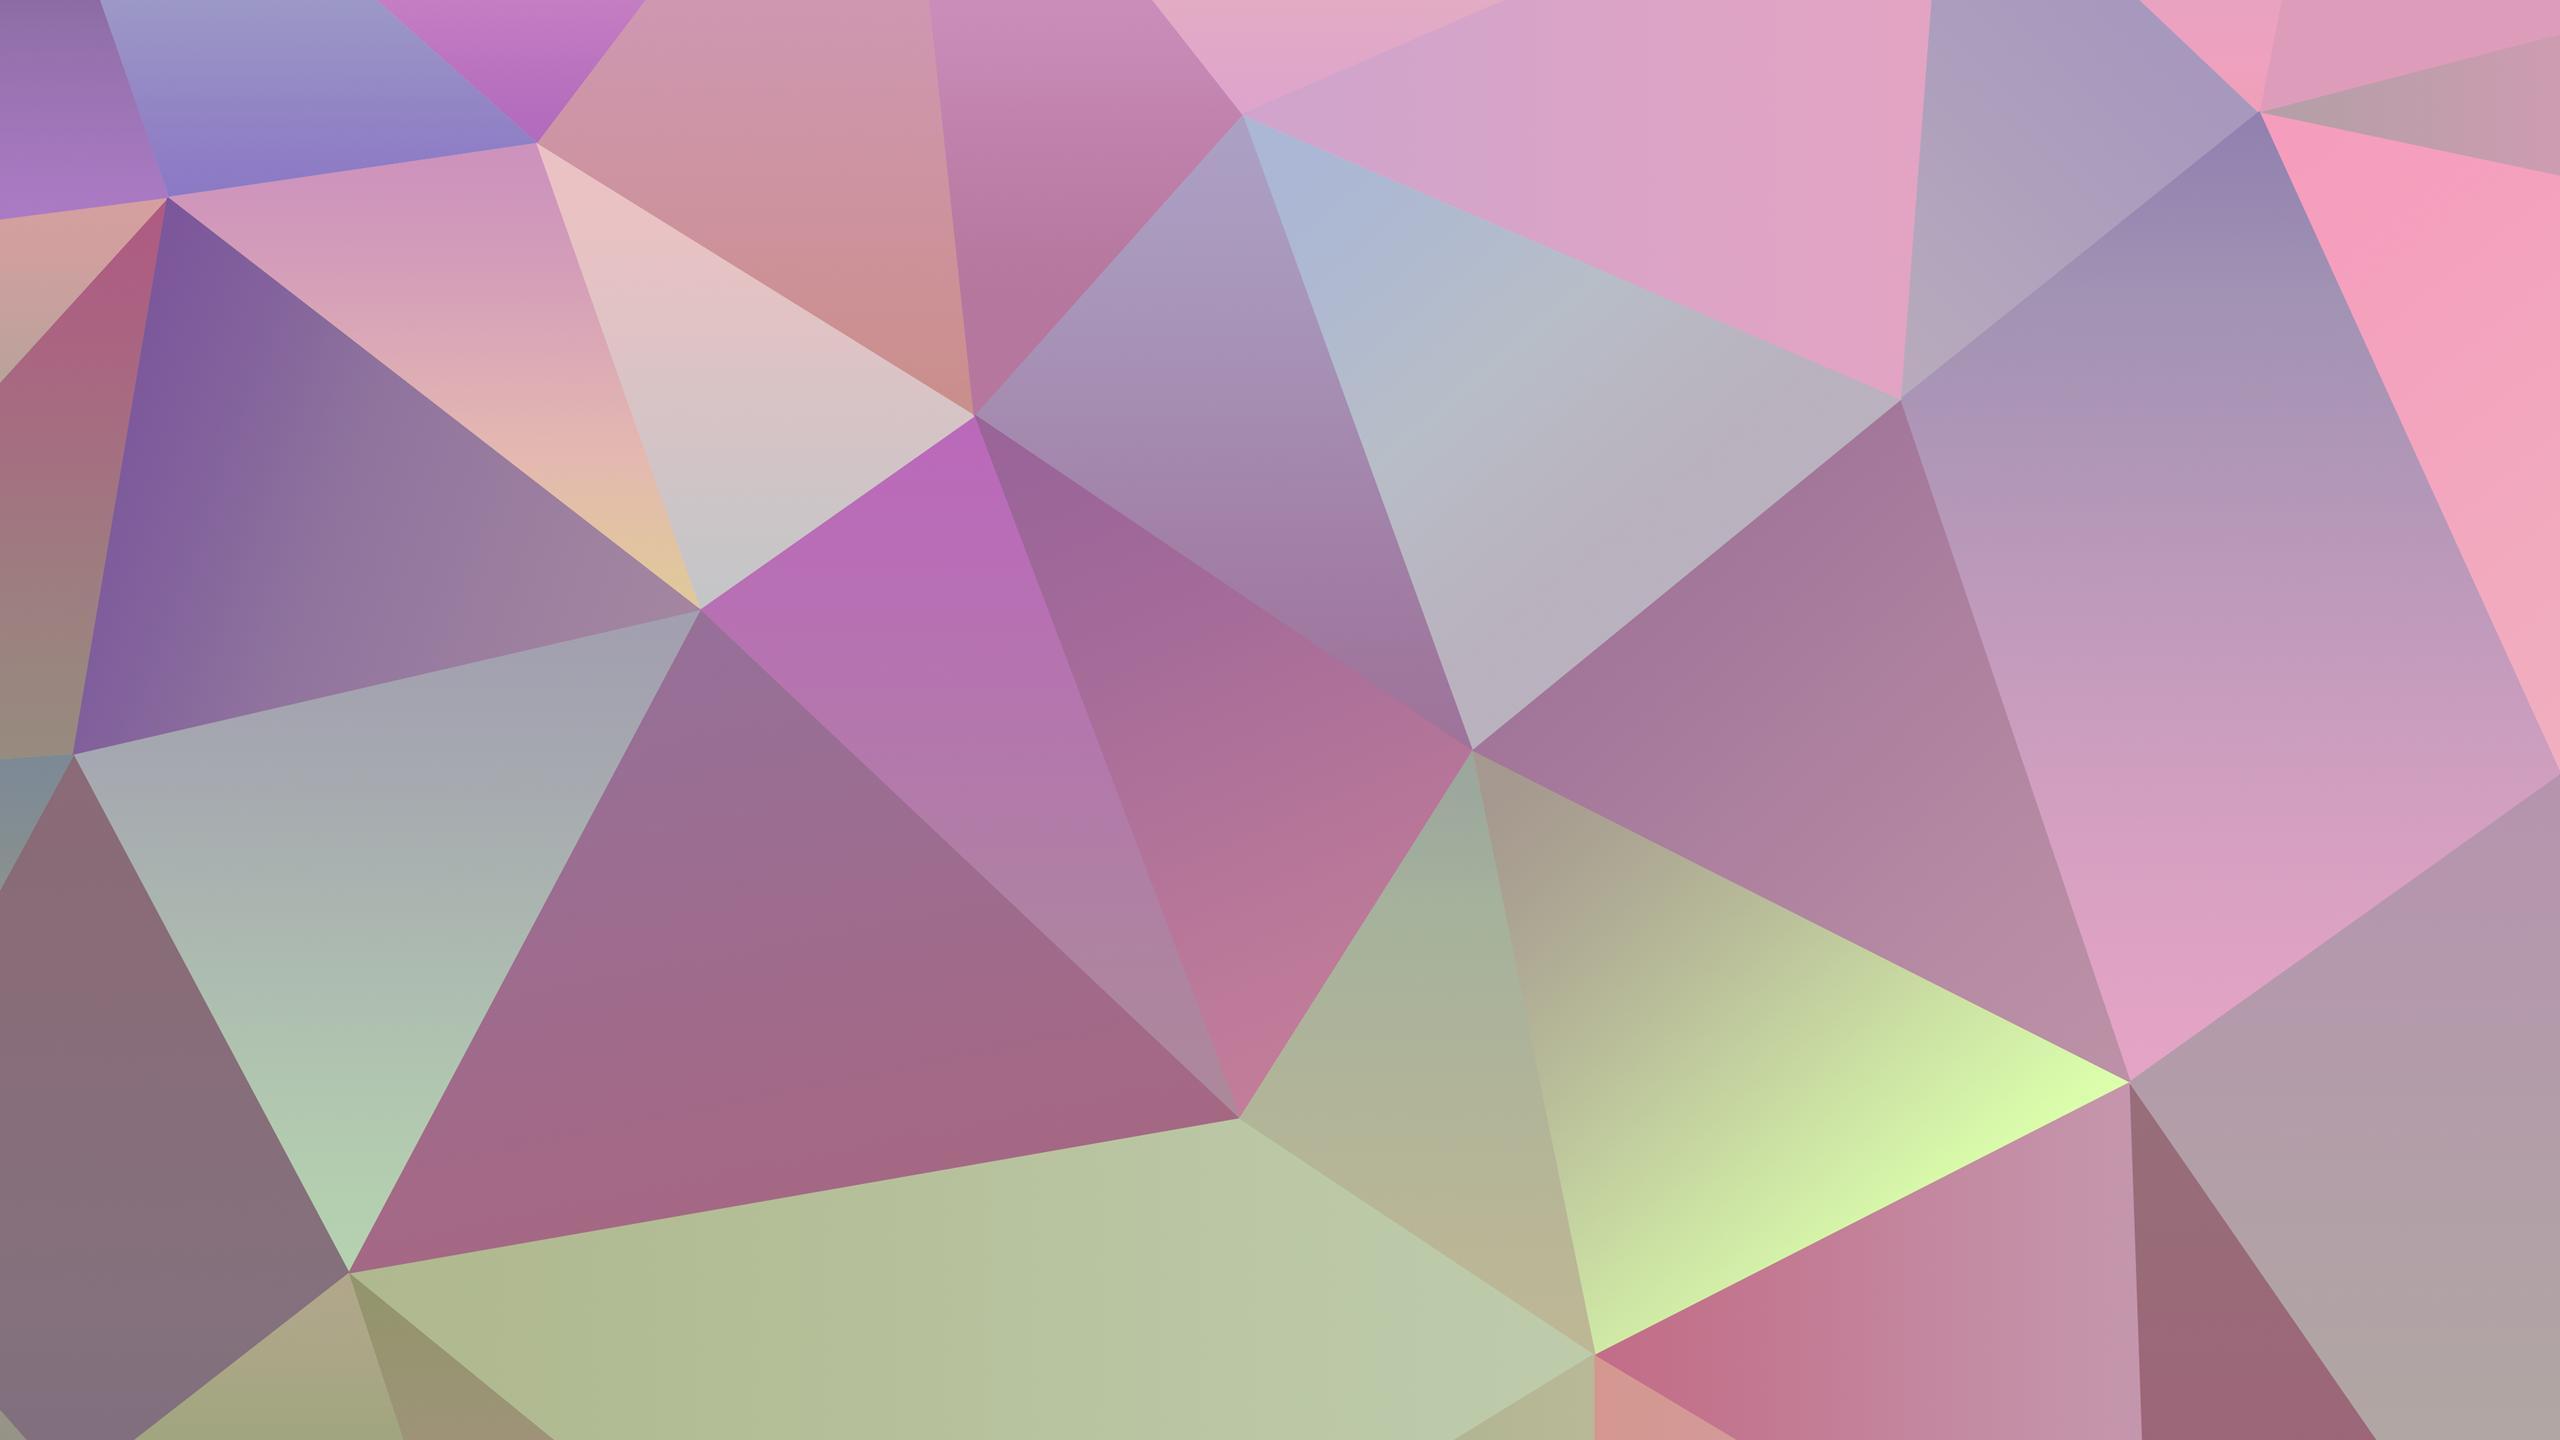 Hd Wallpaper Desktop Pastel